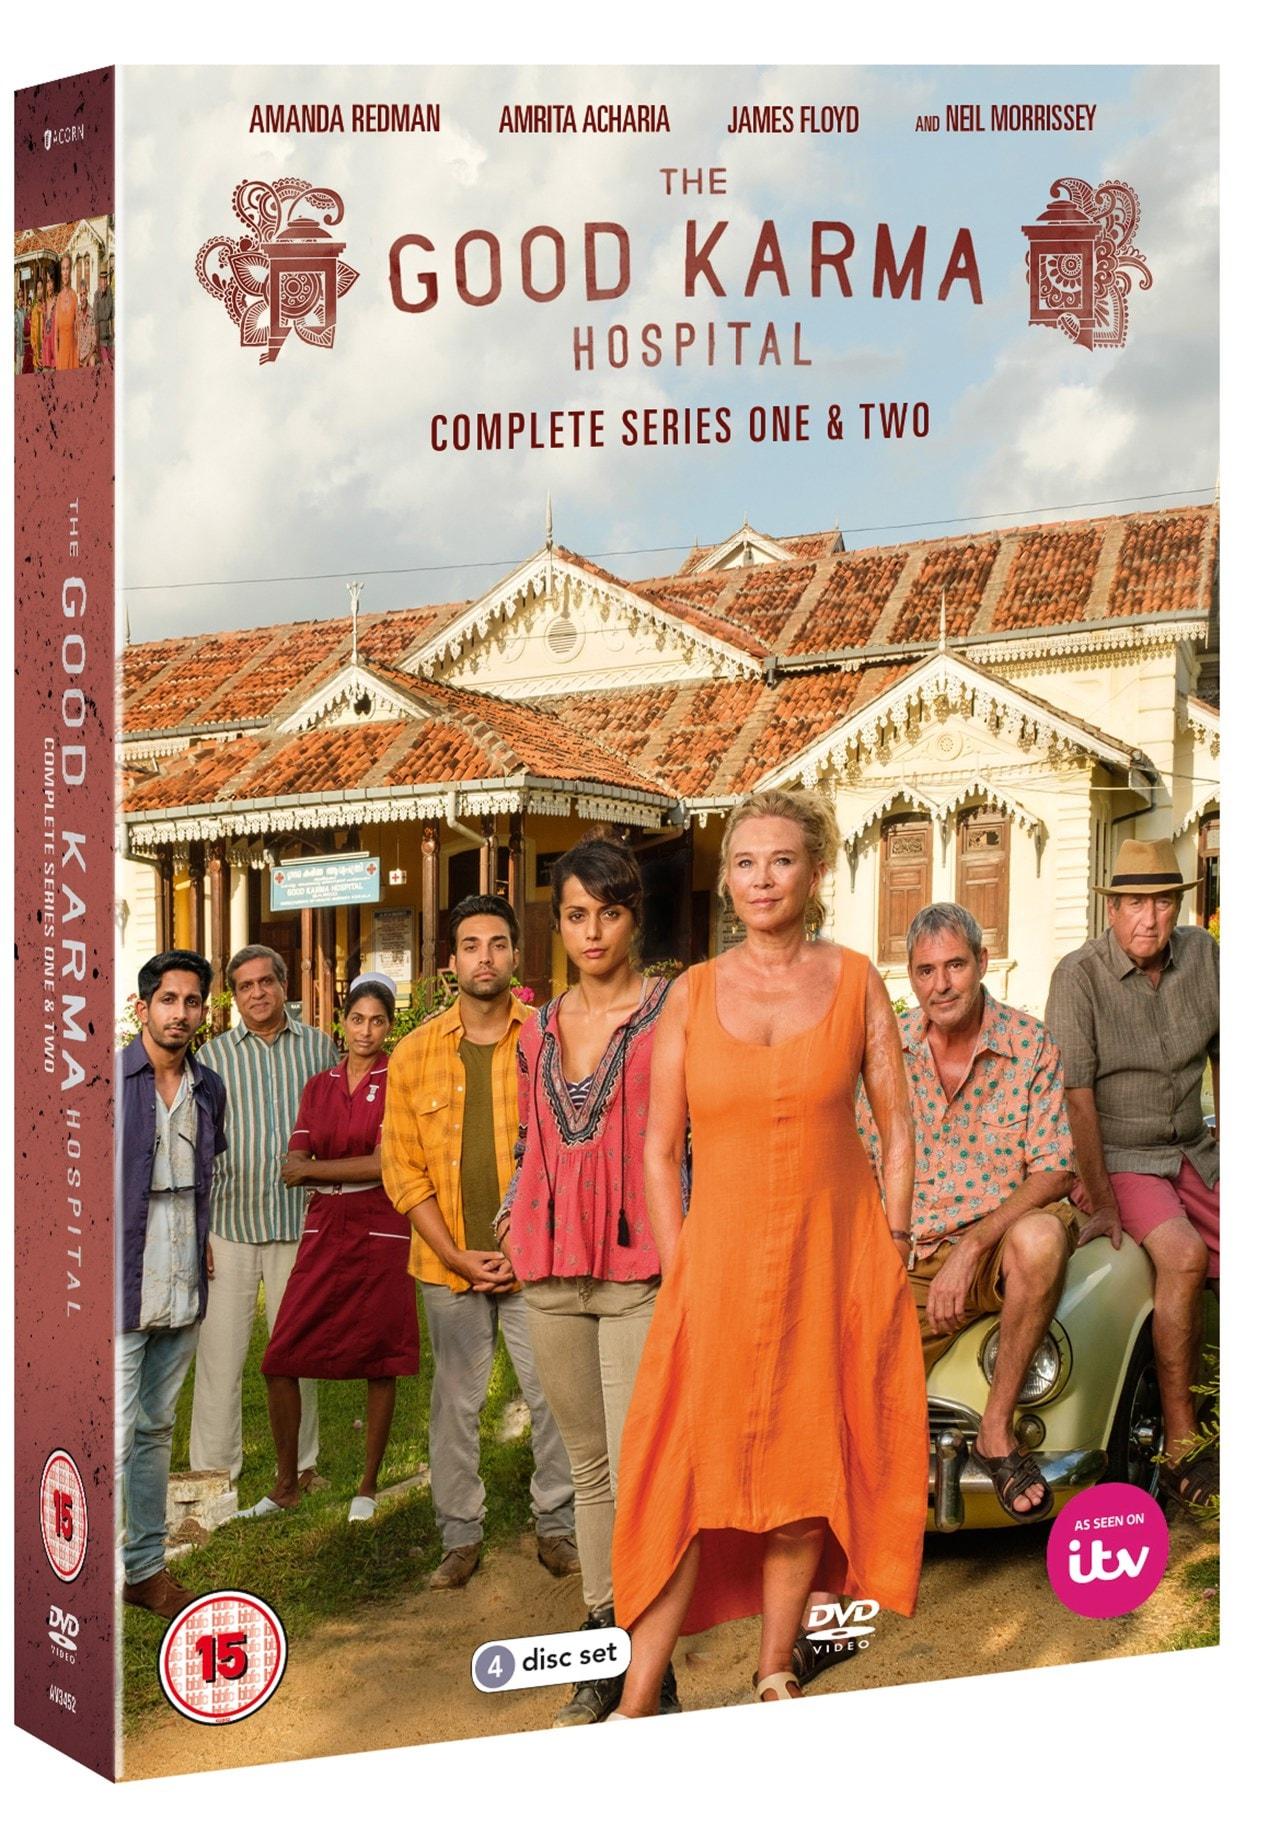 The Good Karma Hospital: Series 1 & 2 - 2